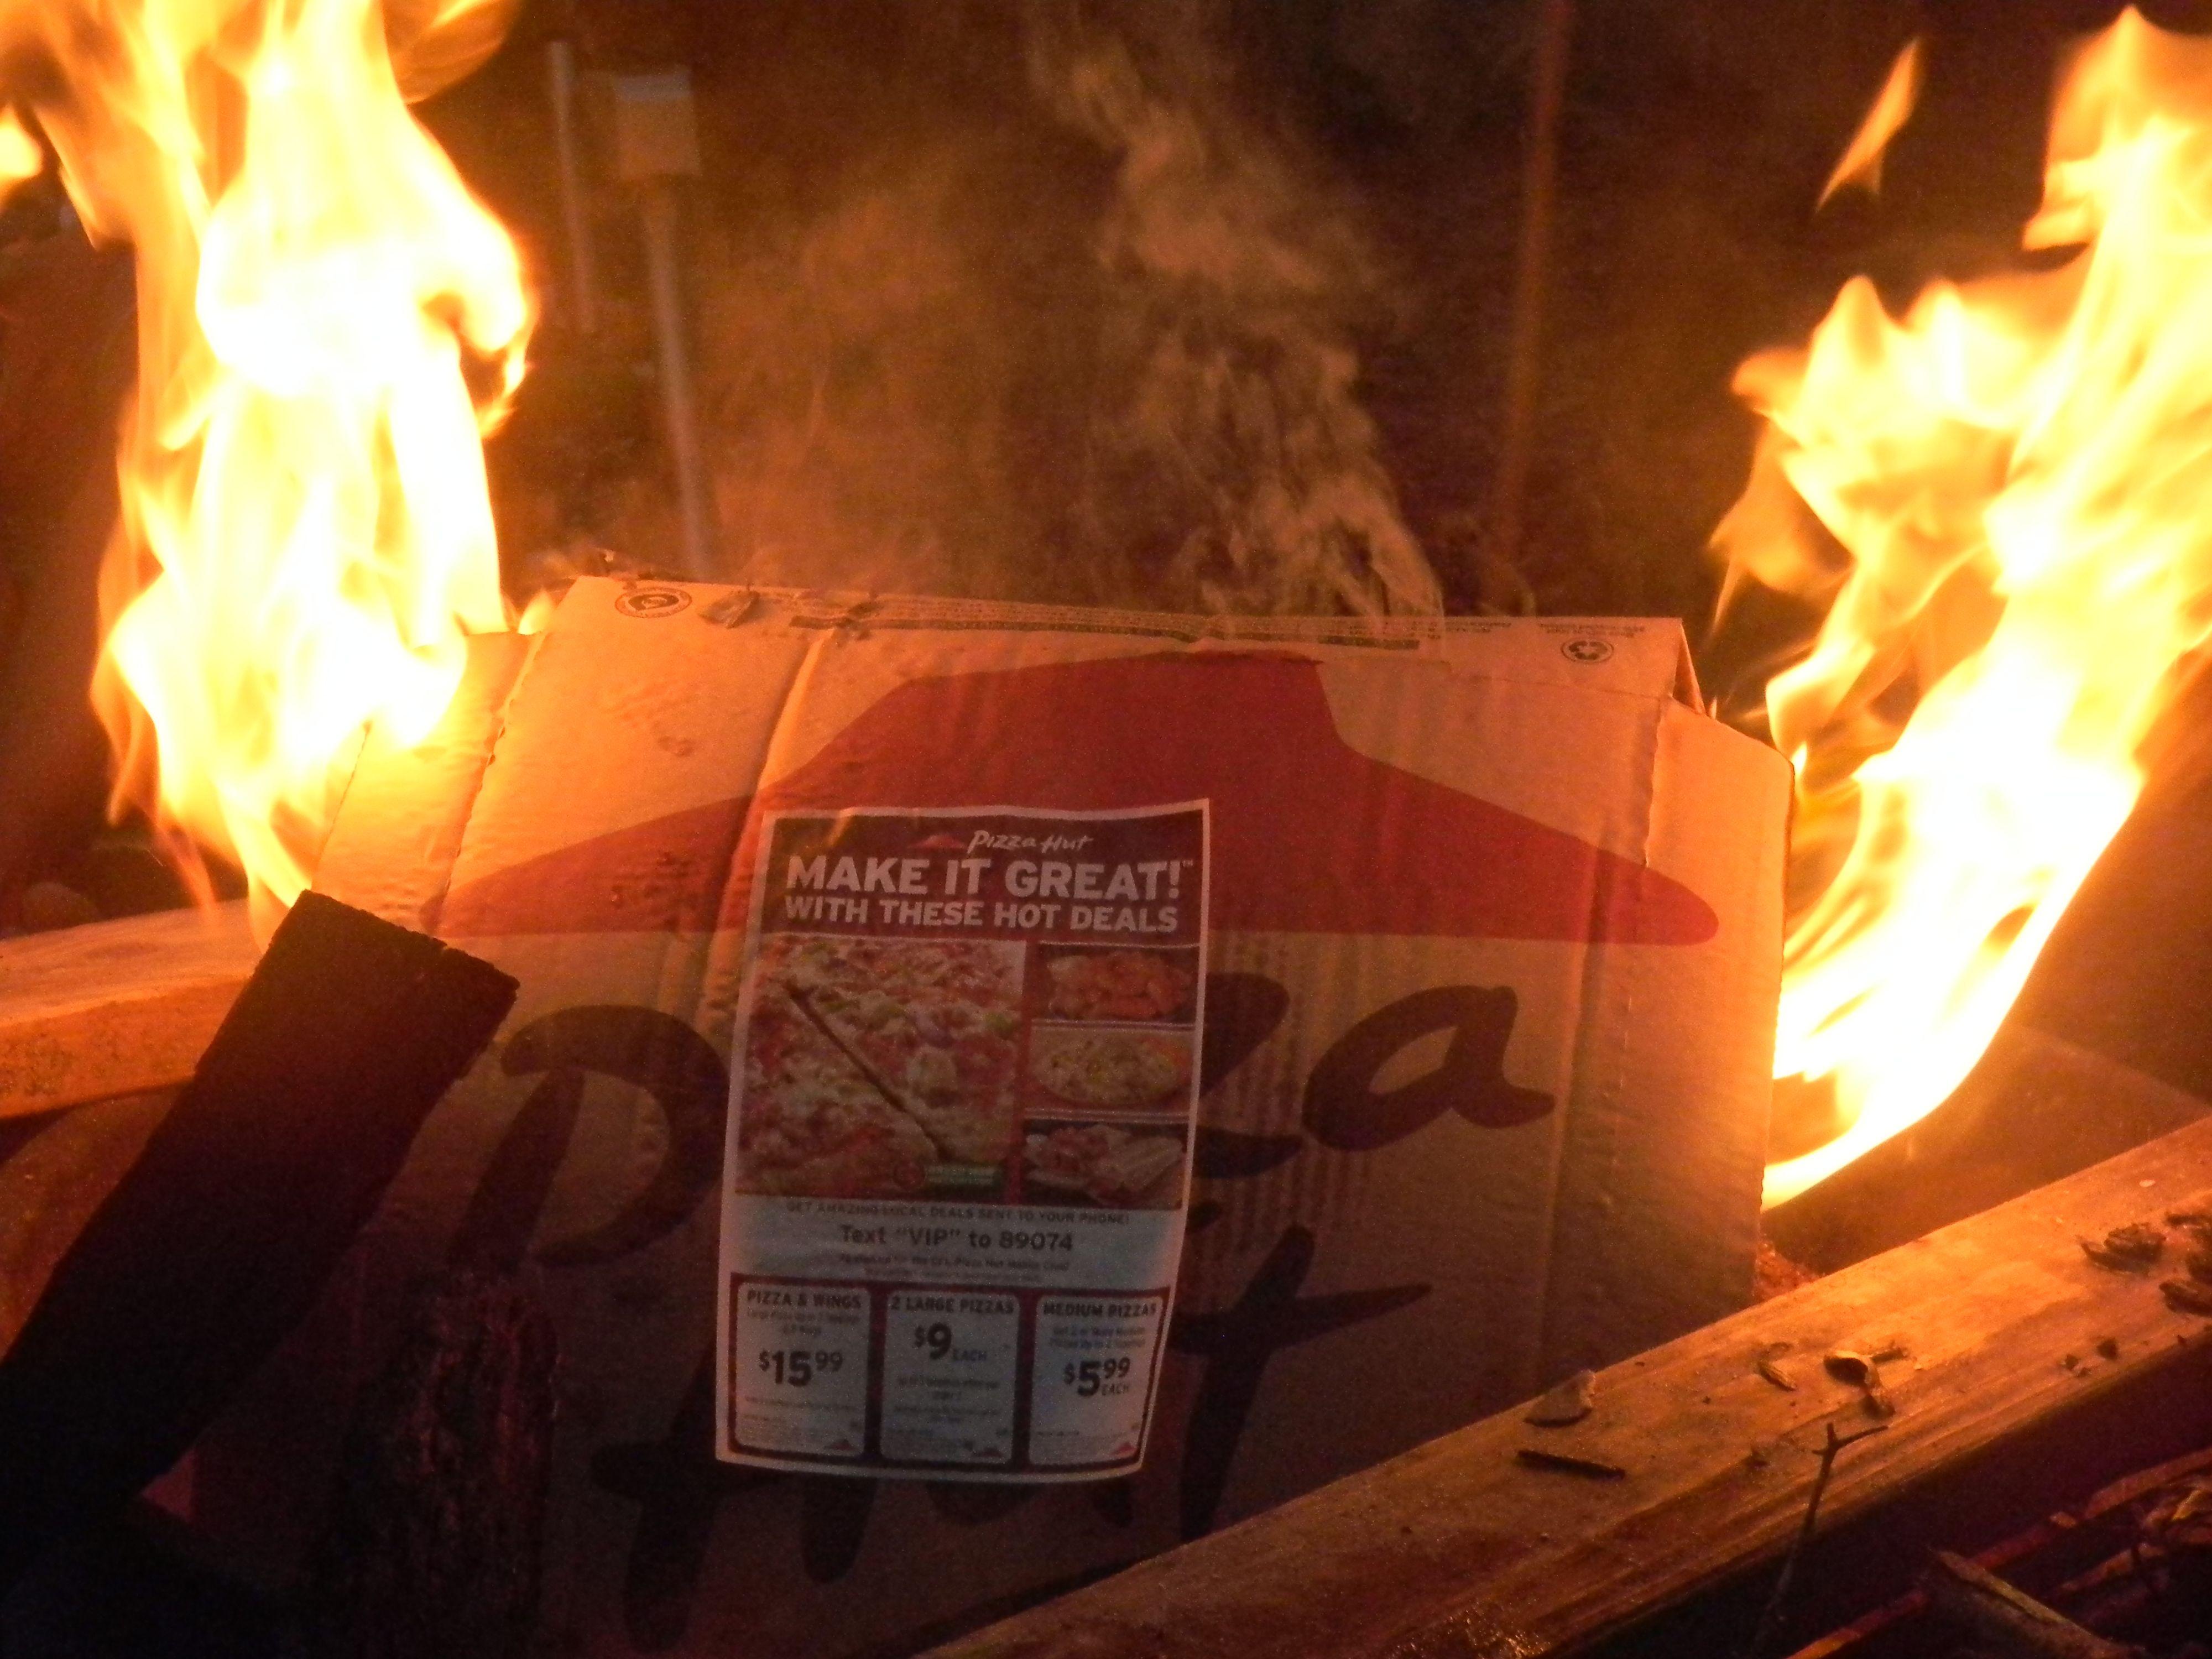 Pizza Hut box on fire graphy 3 Pinterest